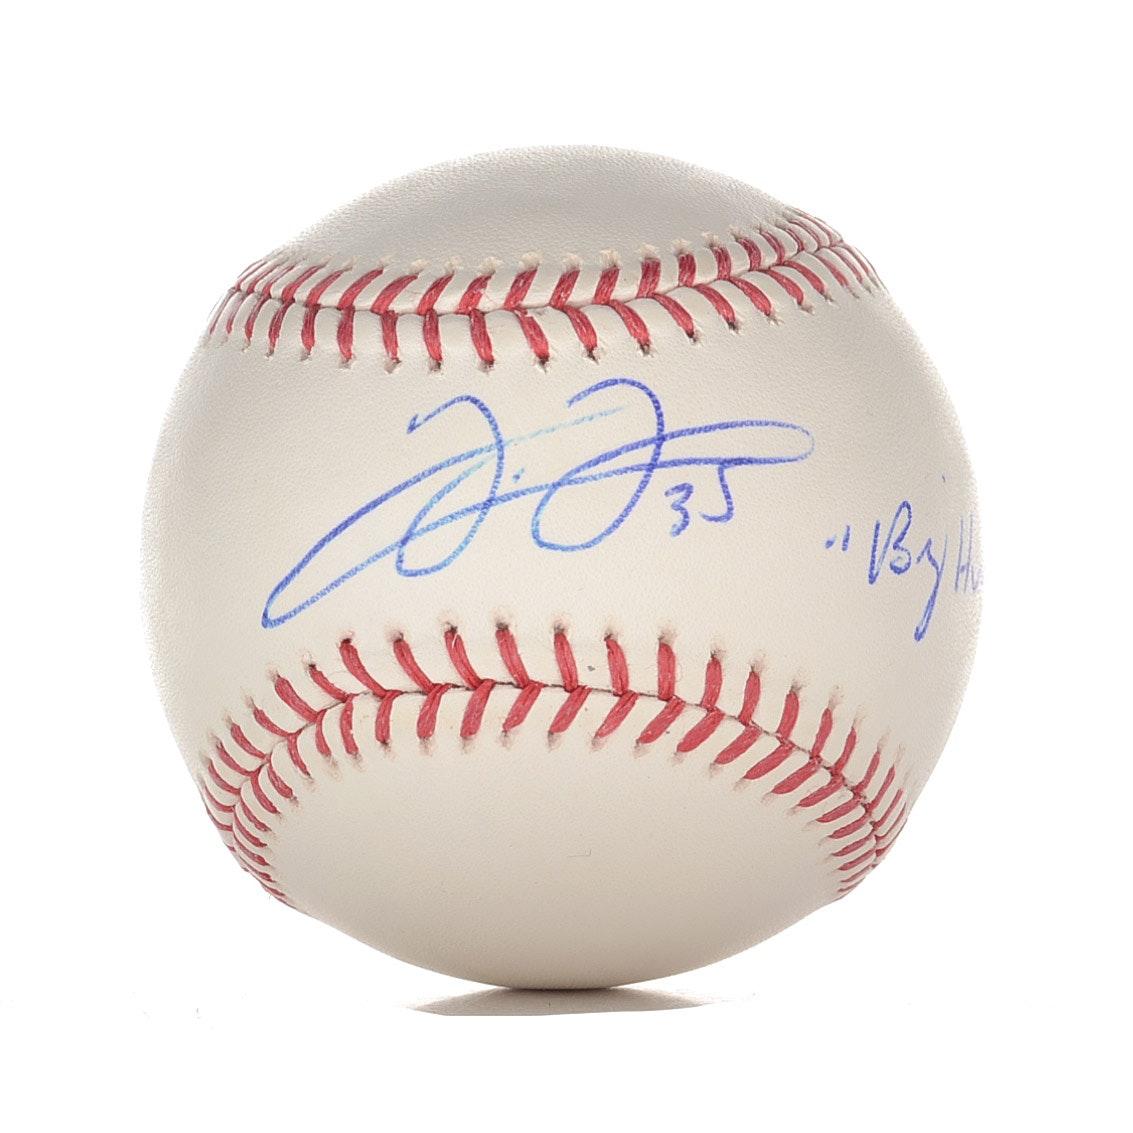 Frank Thomas Signed and Inscribed Baseball  COA